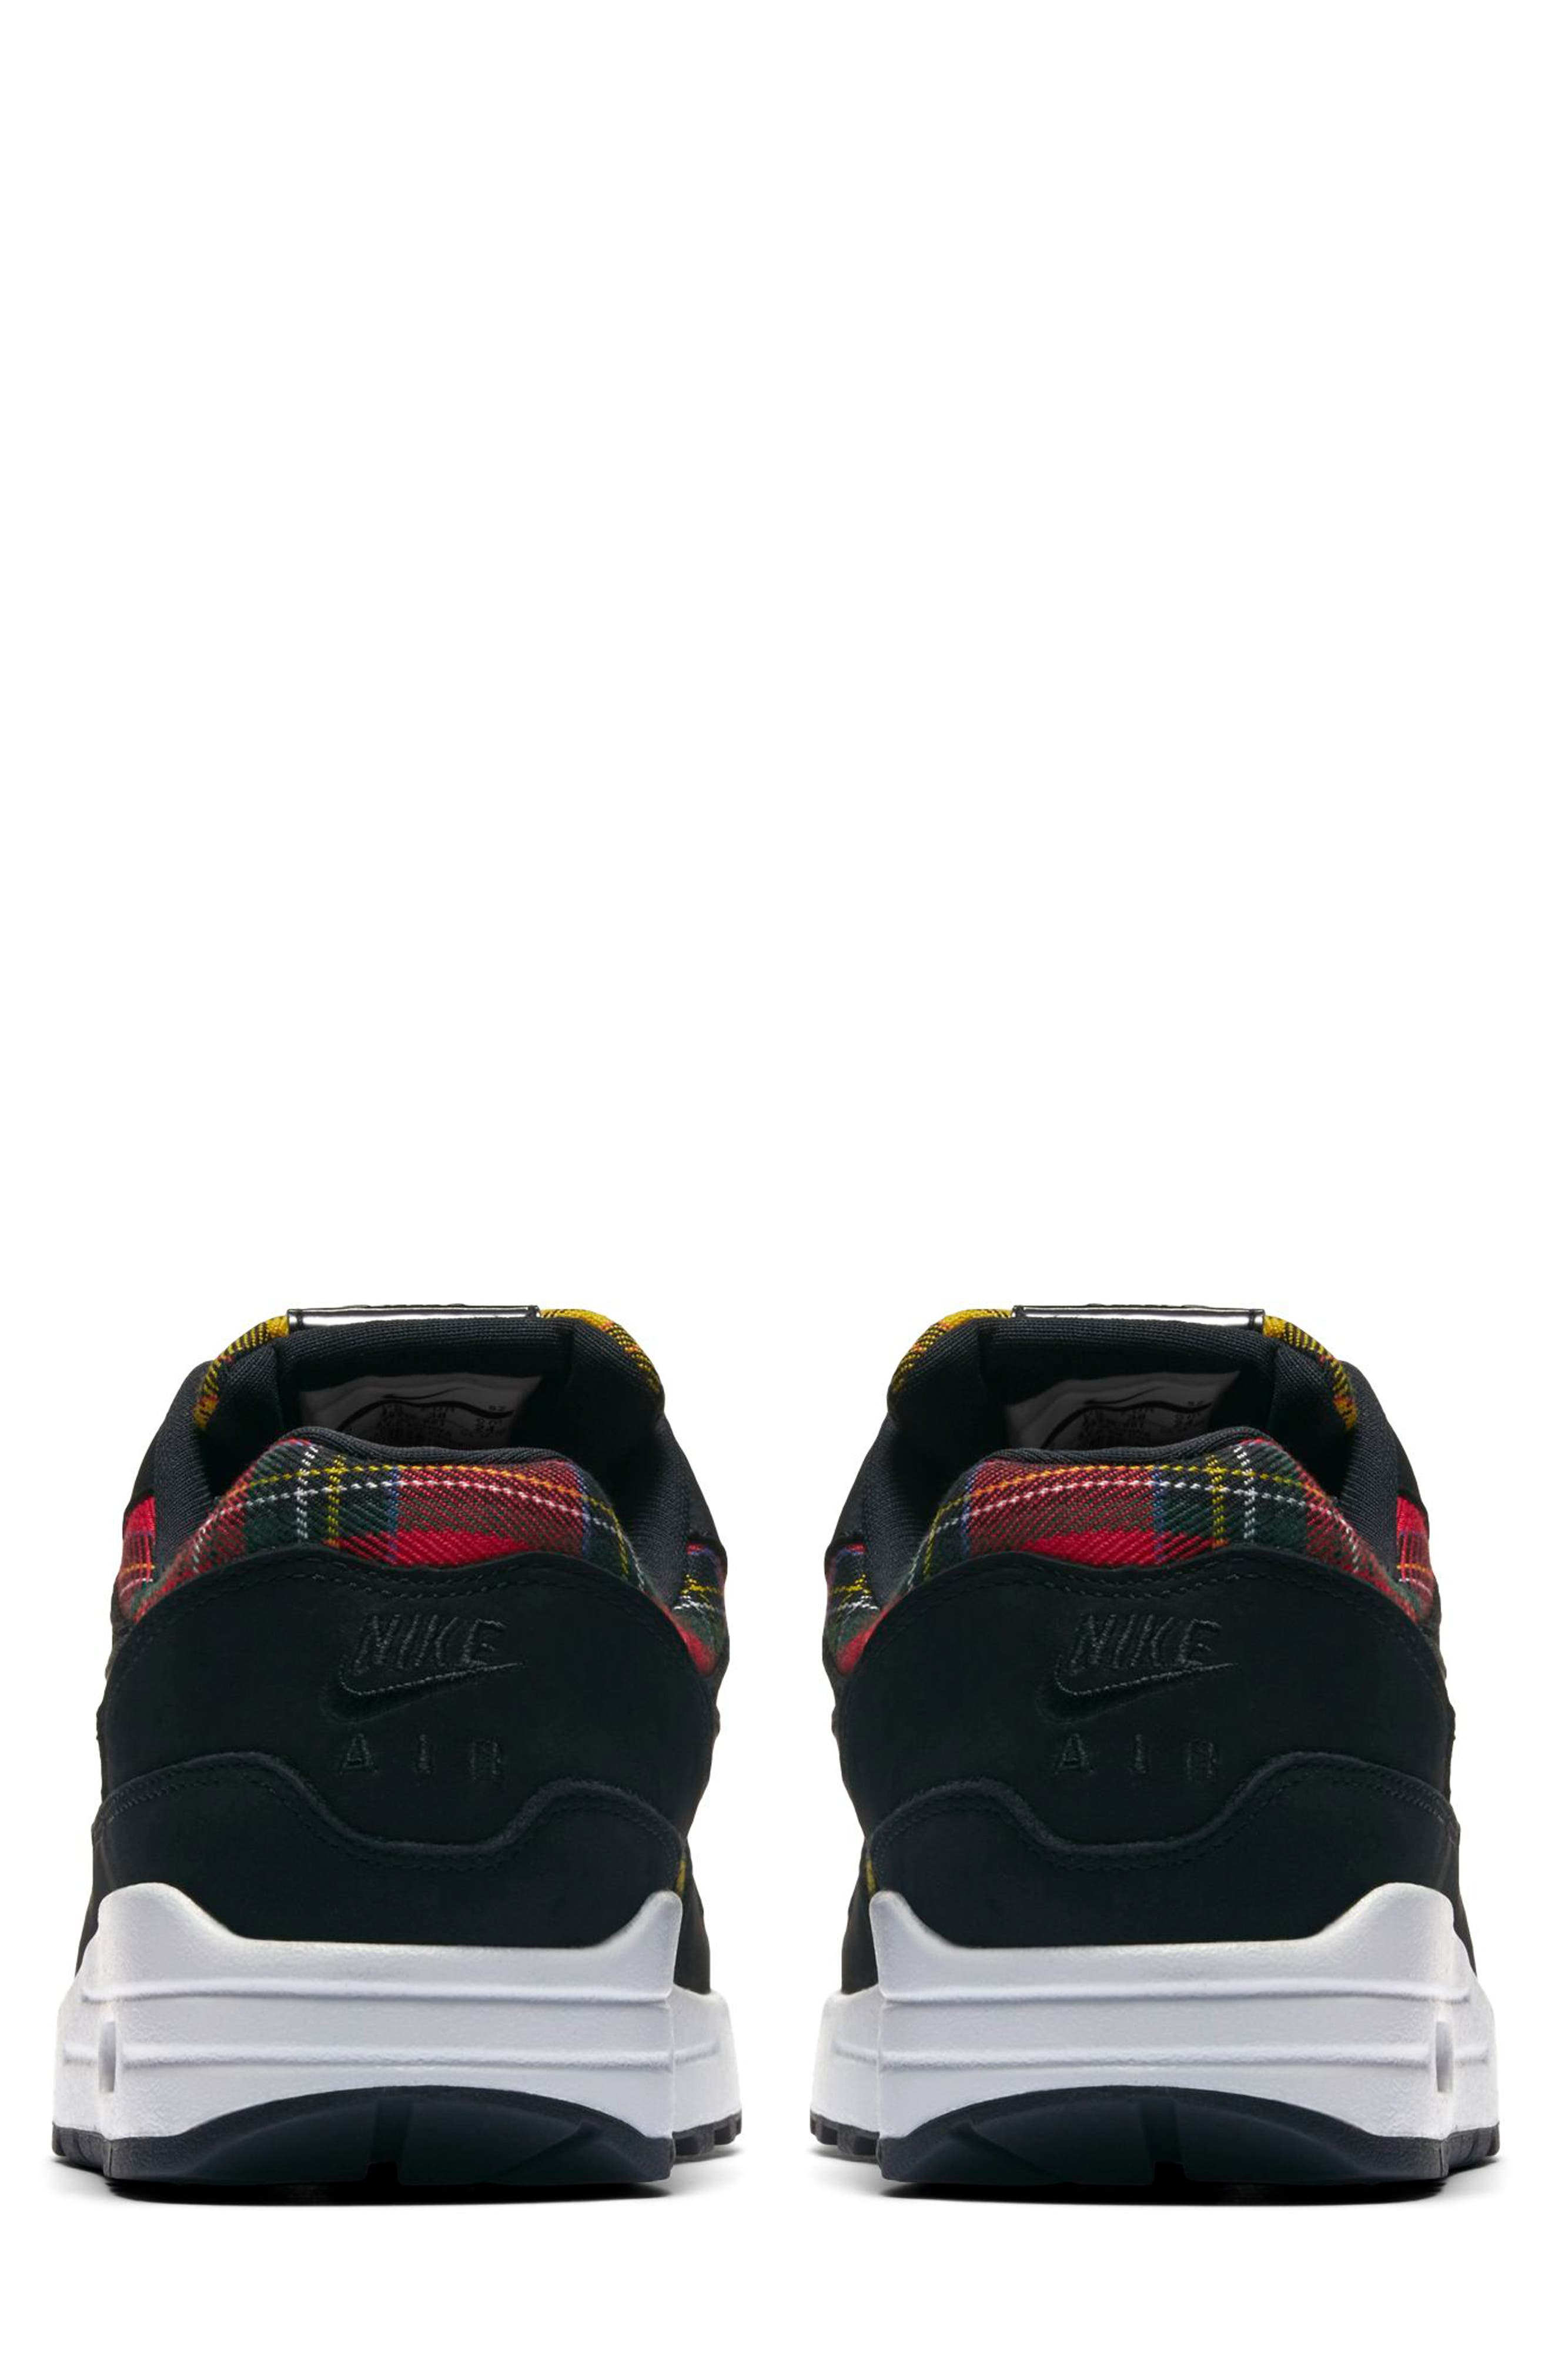 Air Max 1 SE Sneaker,                             Alternate thumbnail 2, color,                             BLACK/ BLACK/ UNIVERSITY RED